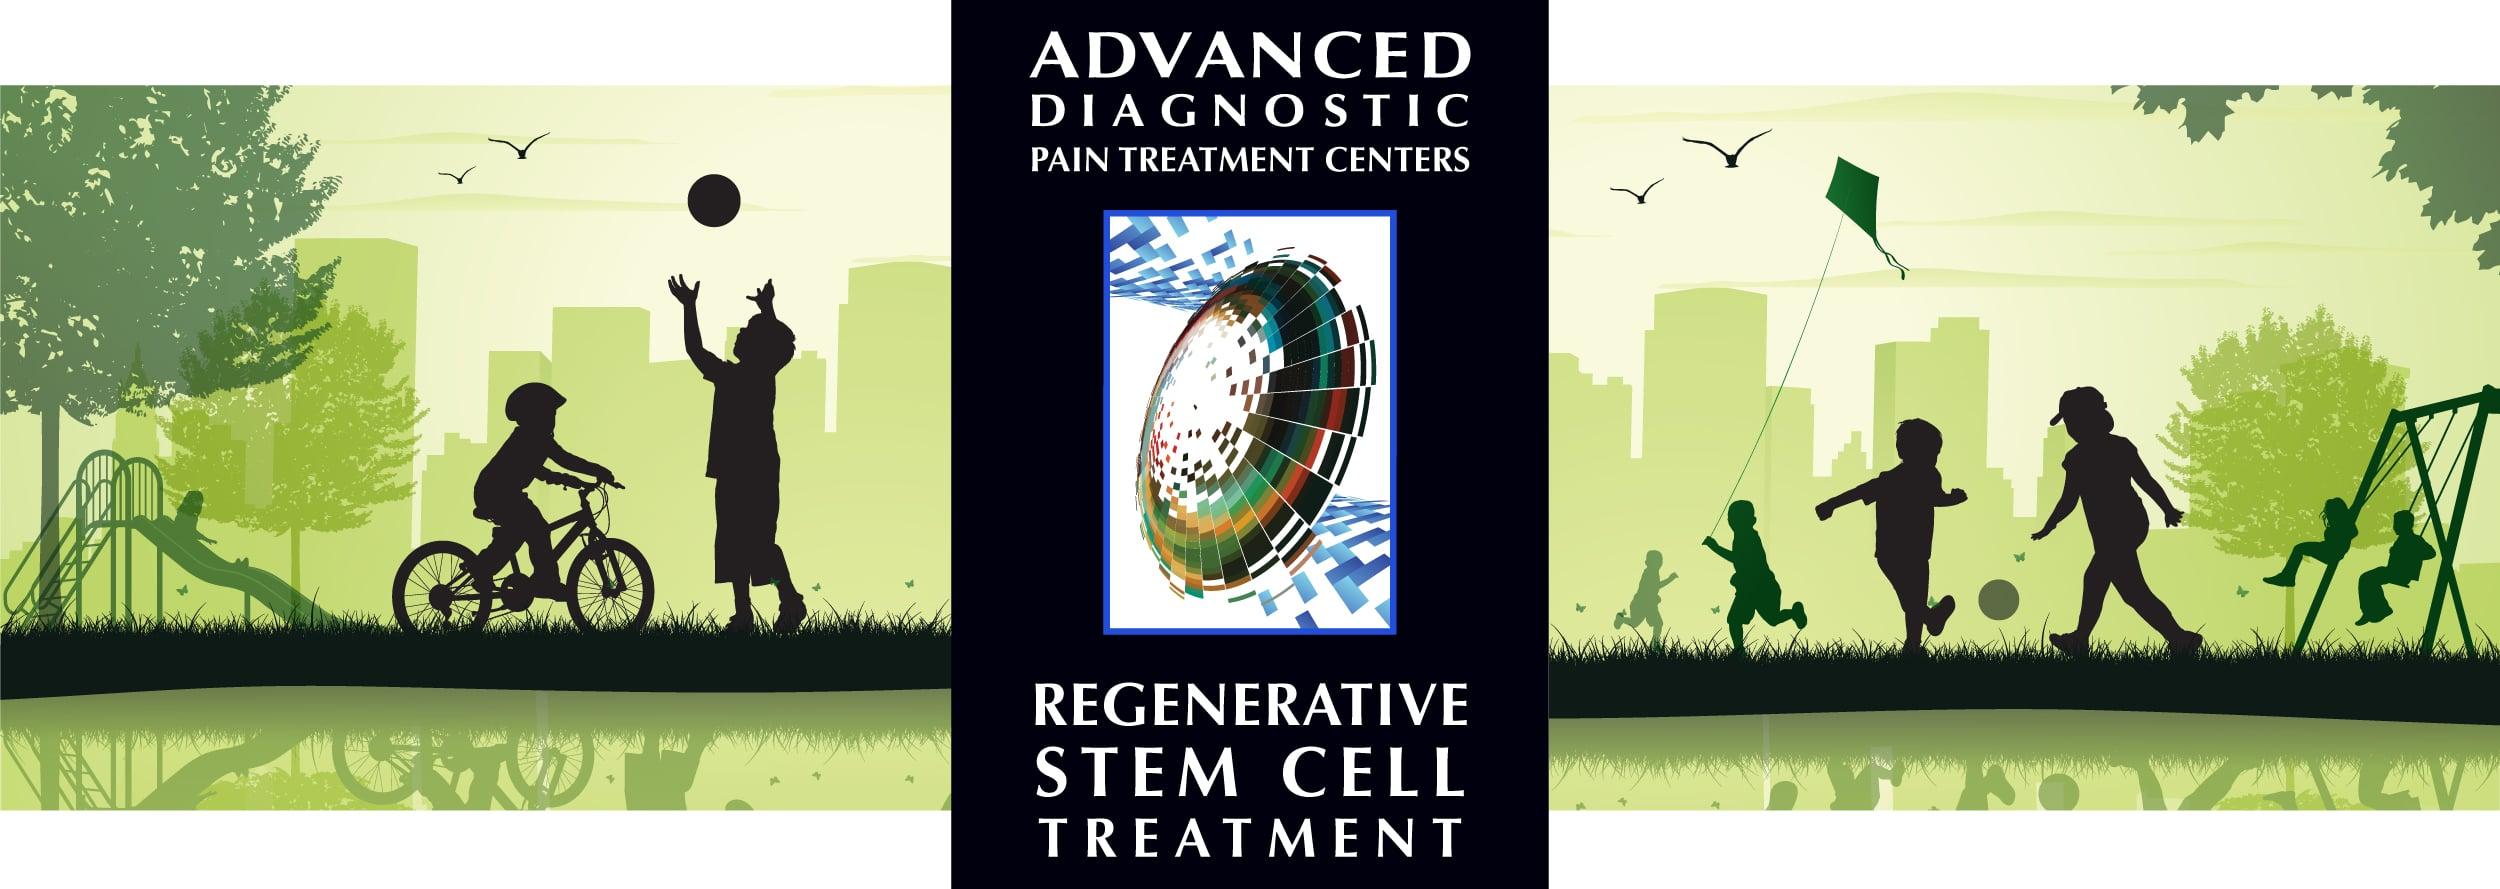 Advanced Diagnostic Regenerative Stem Cell Treatment logo